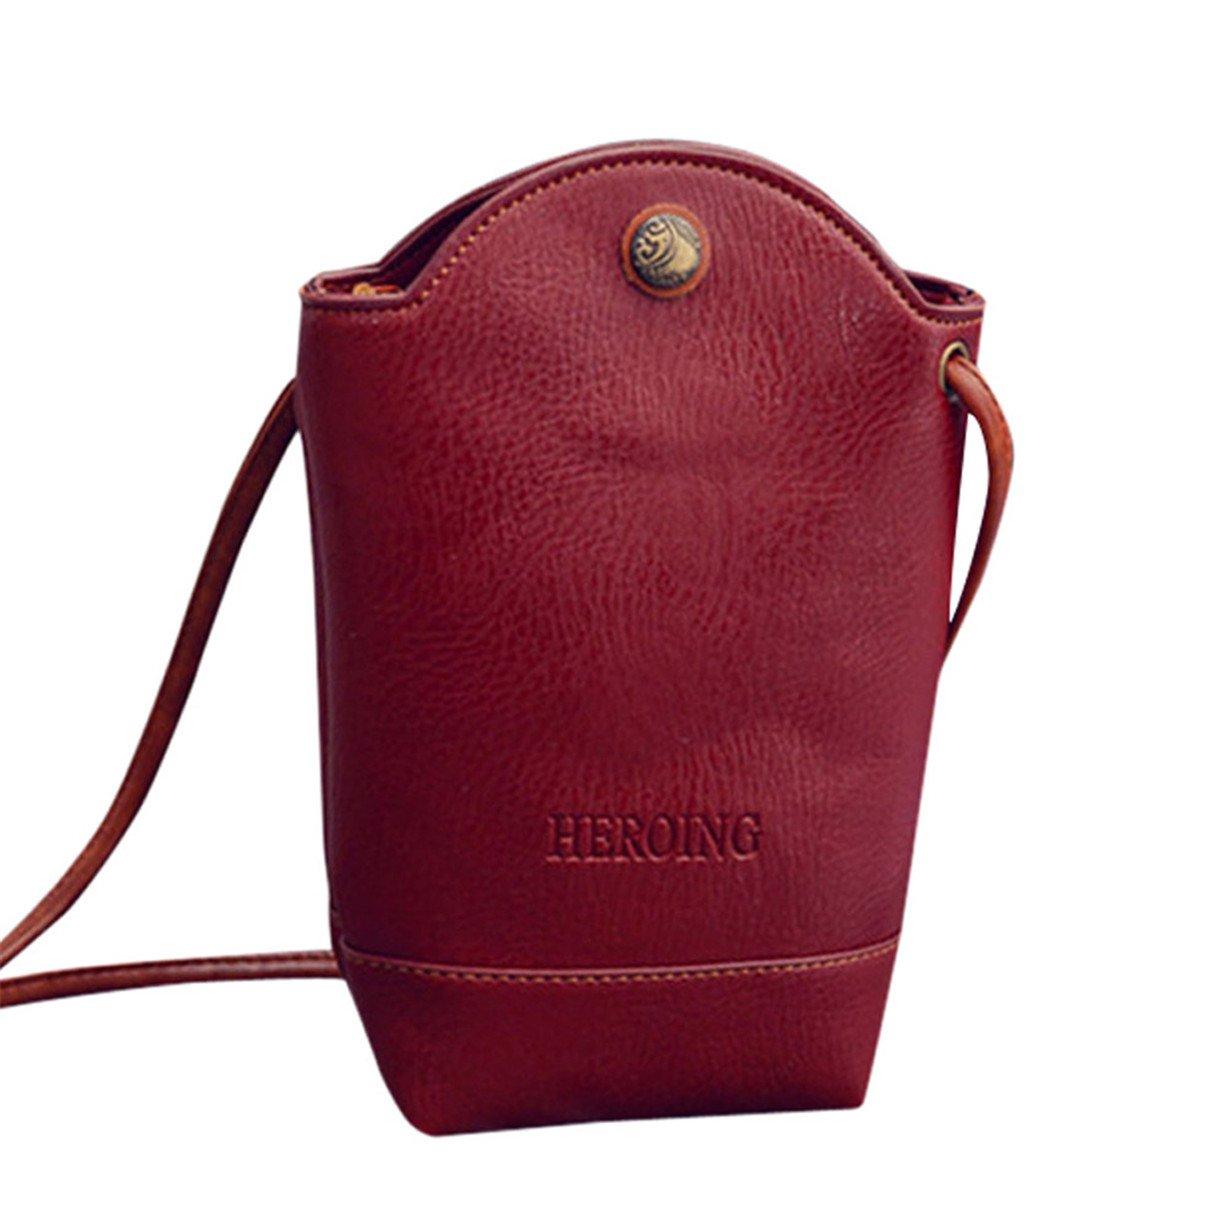 Yuan Ladies Mini Handbag Crossbody Shoulder Messenger Bag